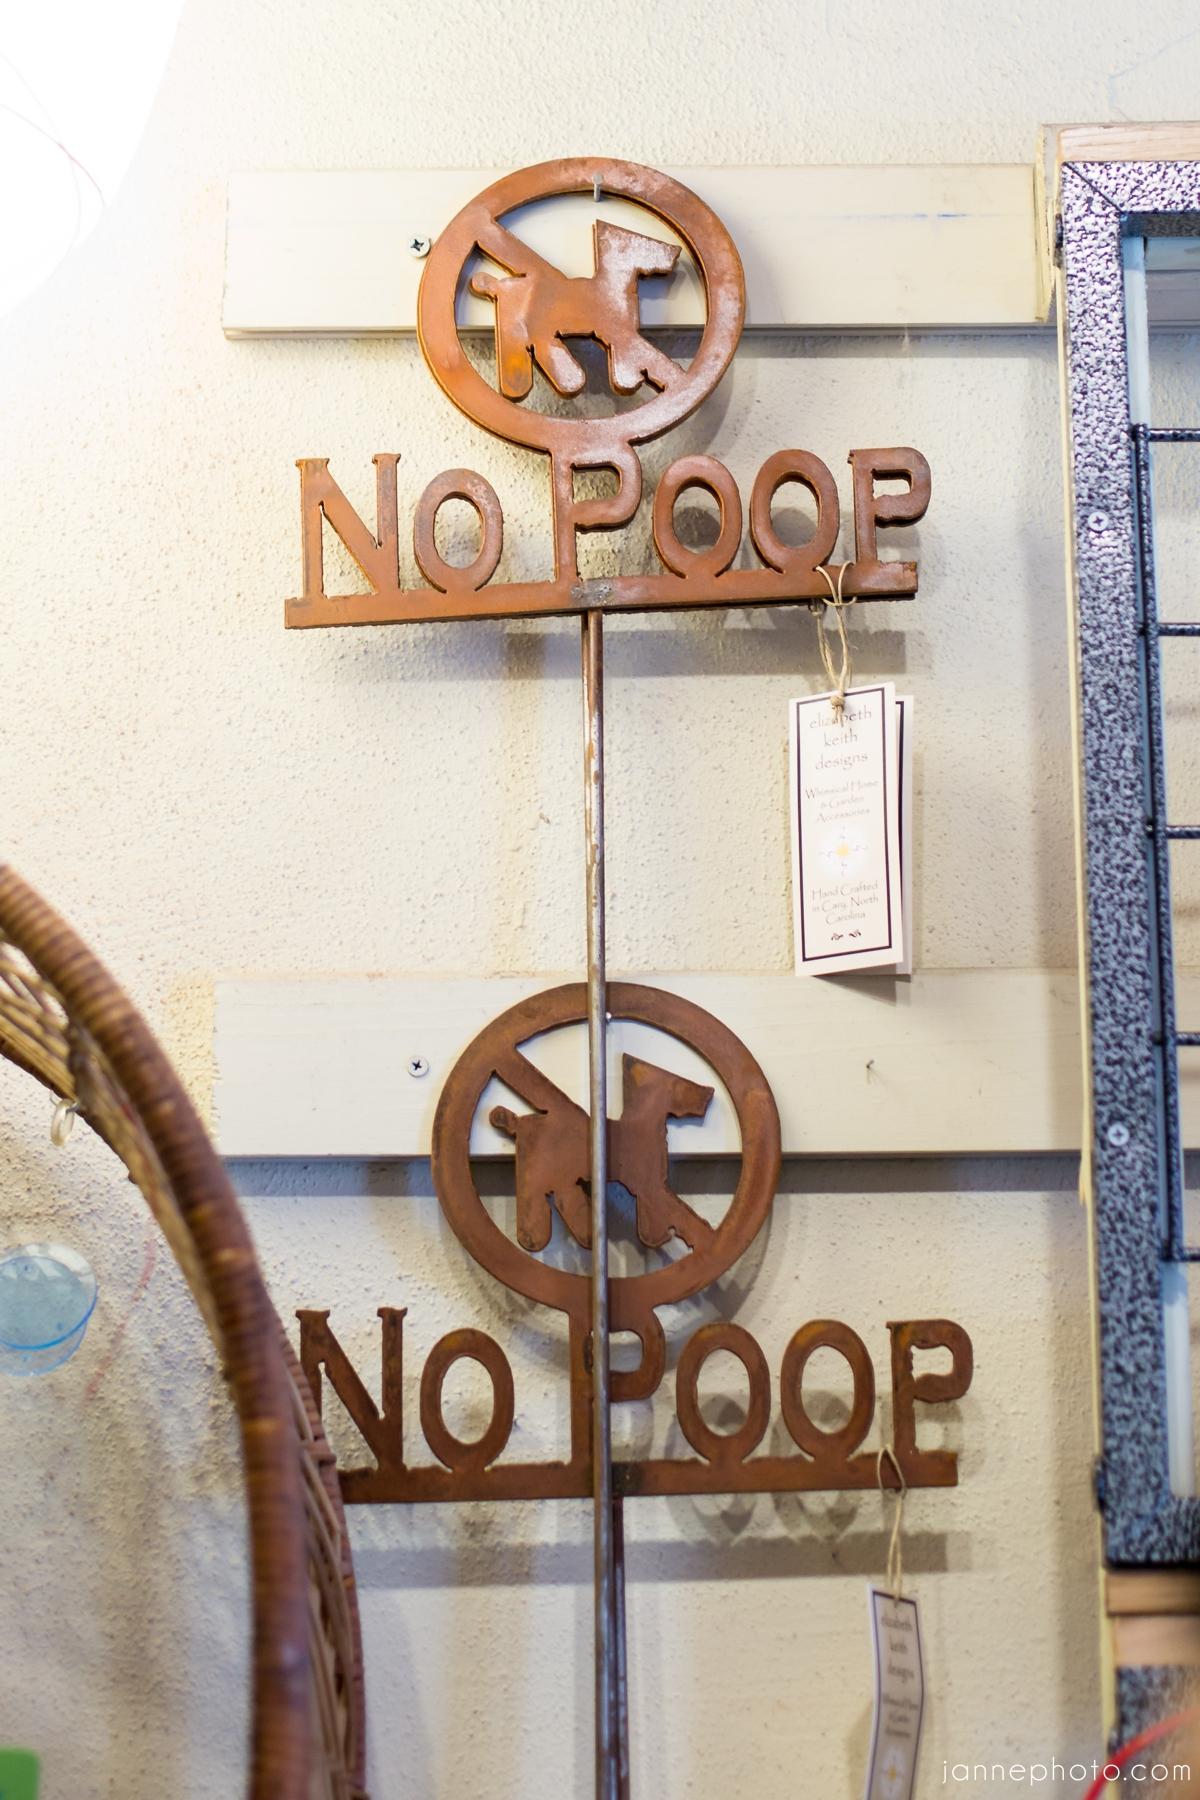 asheville-nc-no-poop